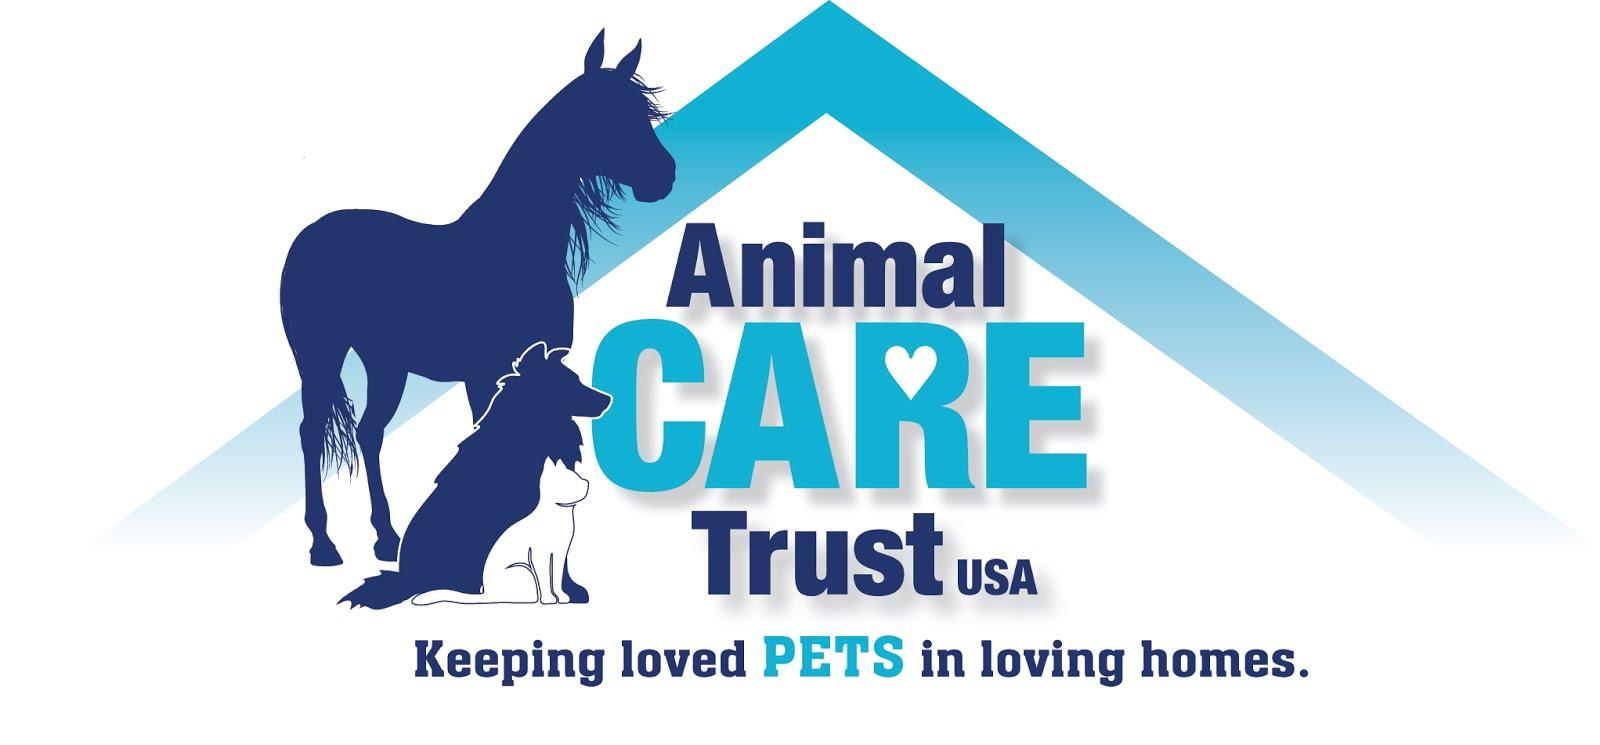 Animal Care Trust USA